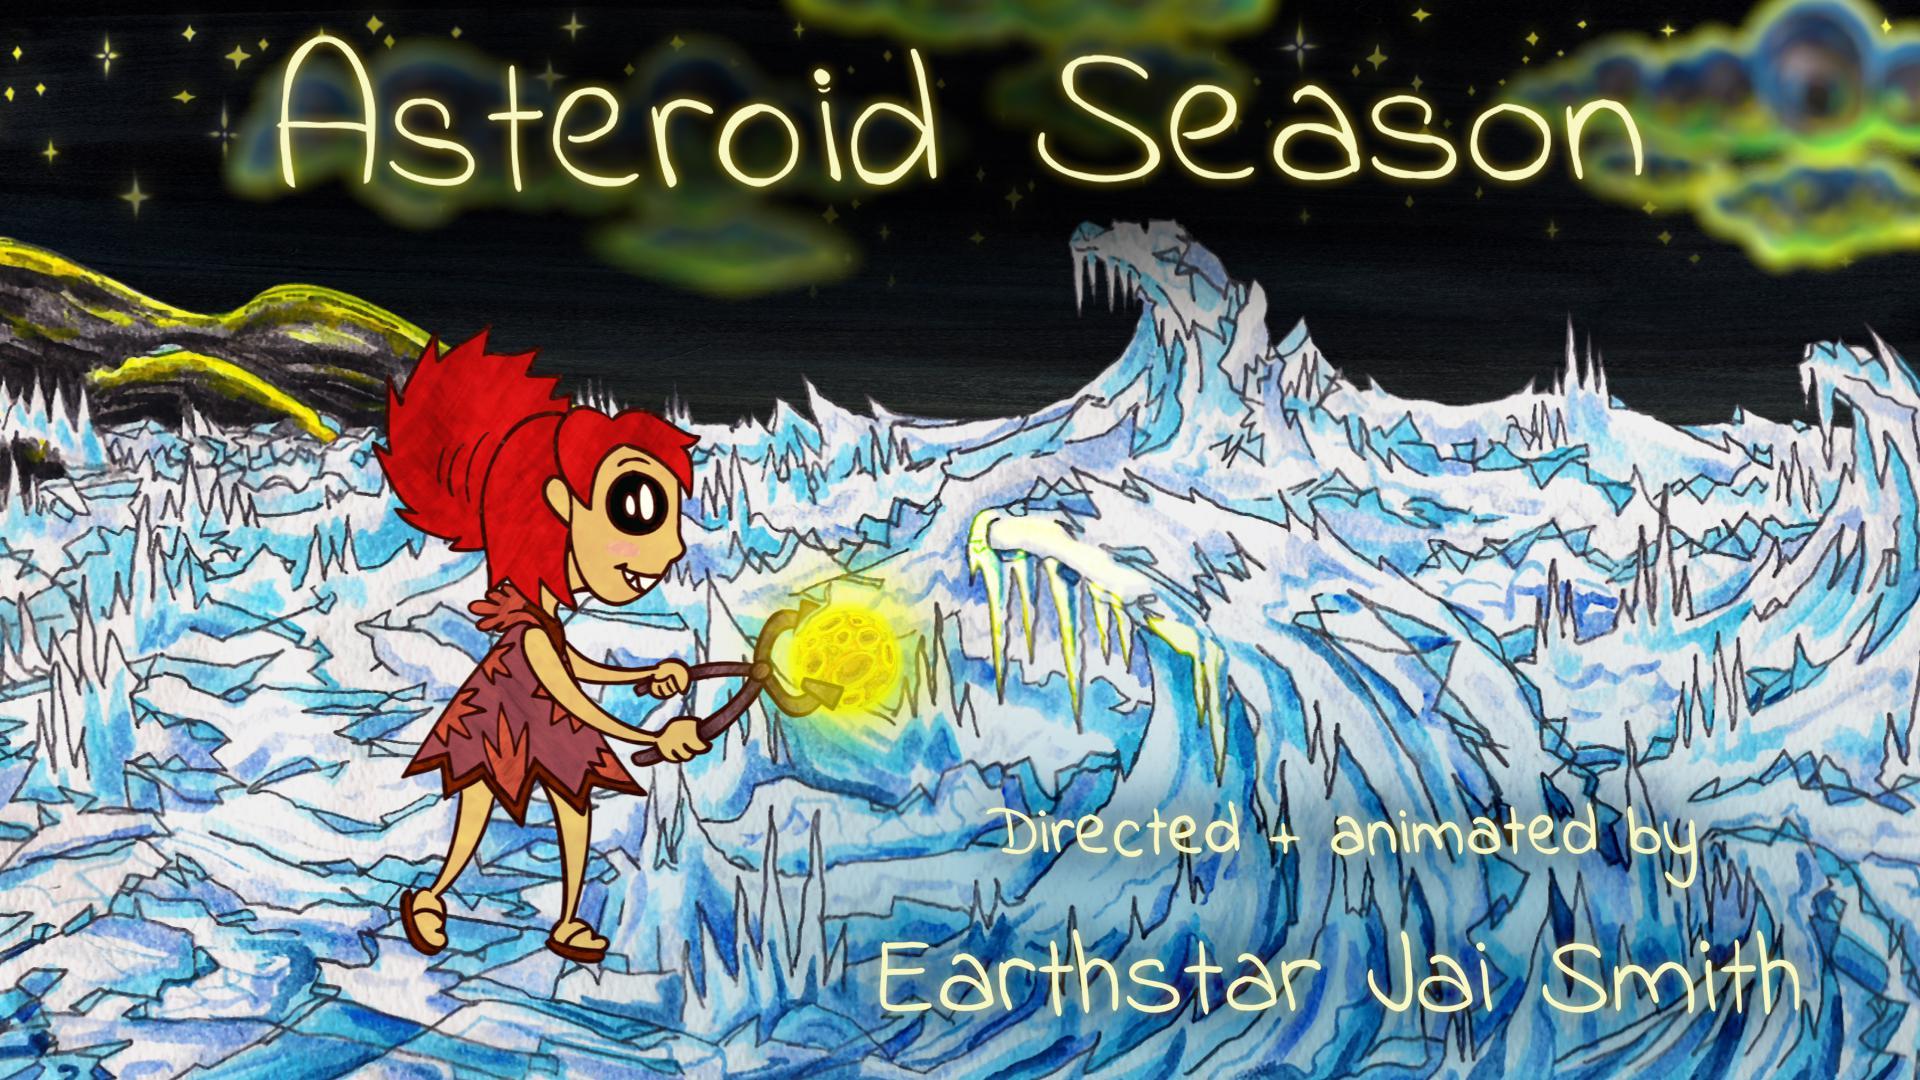 Asteroid Season